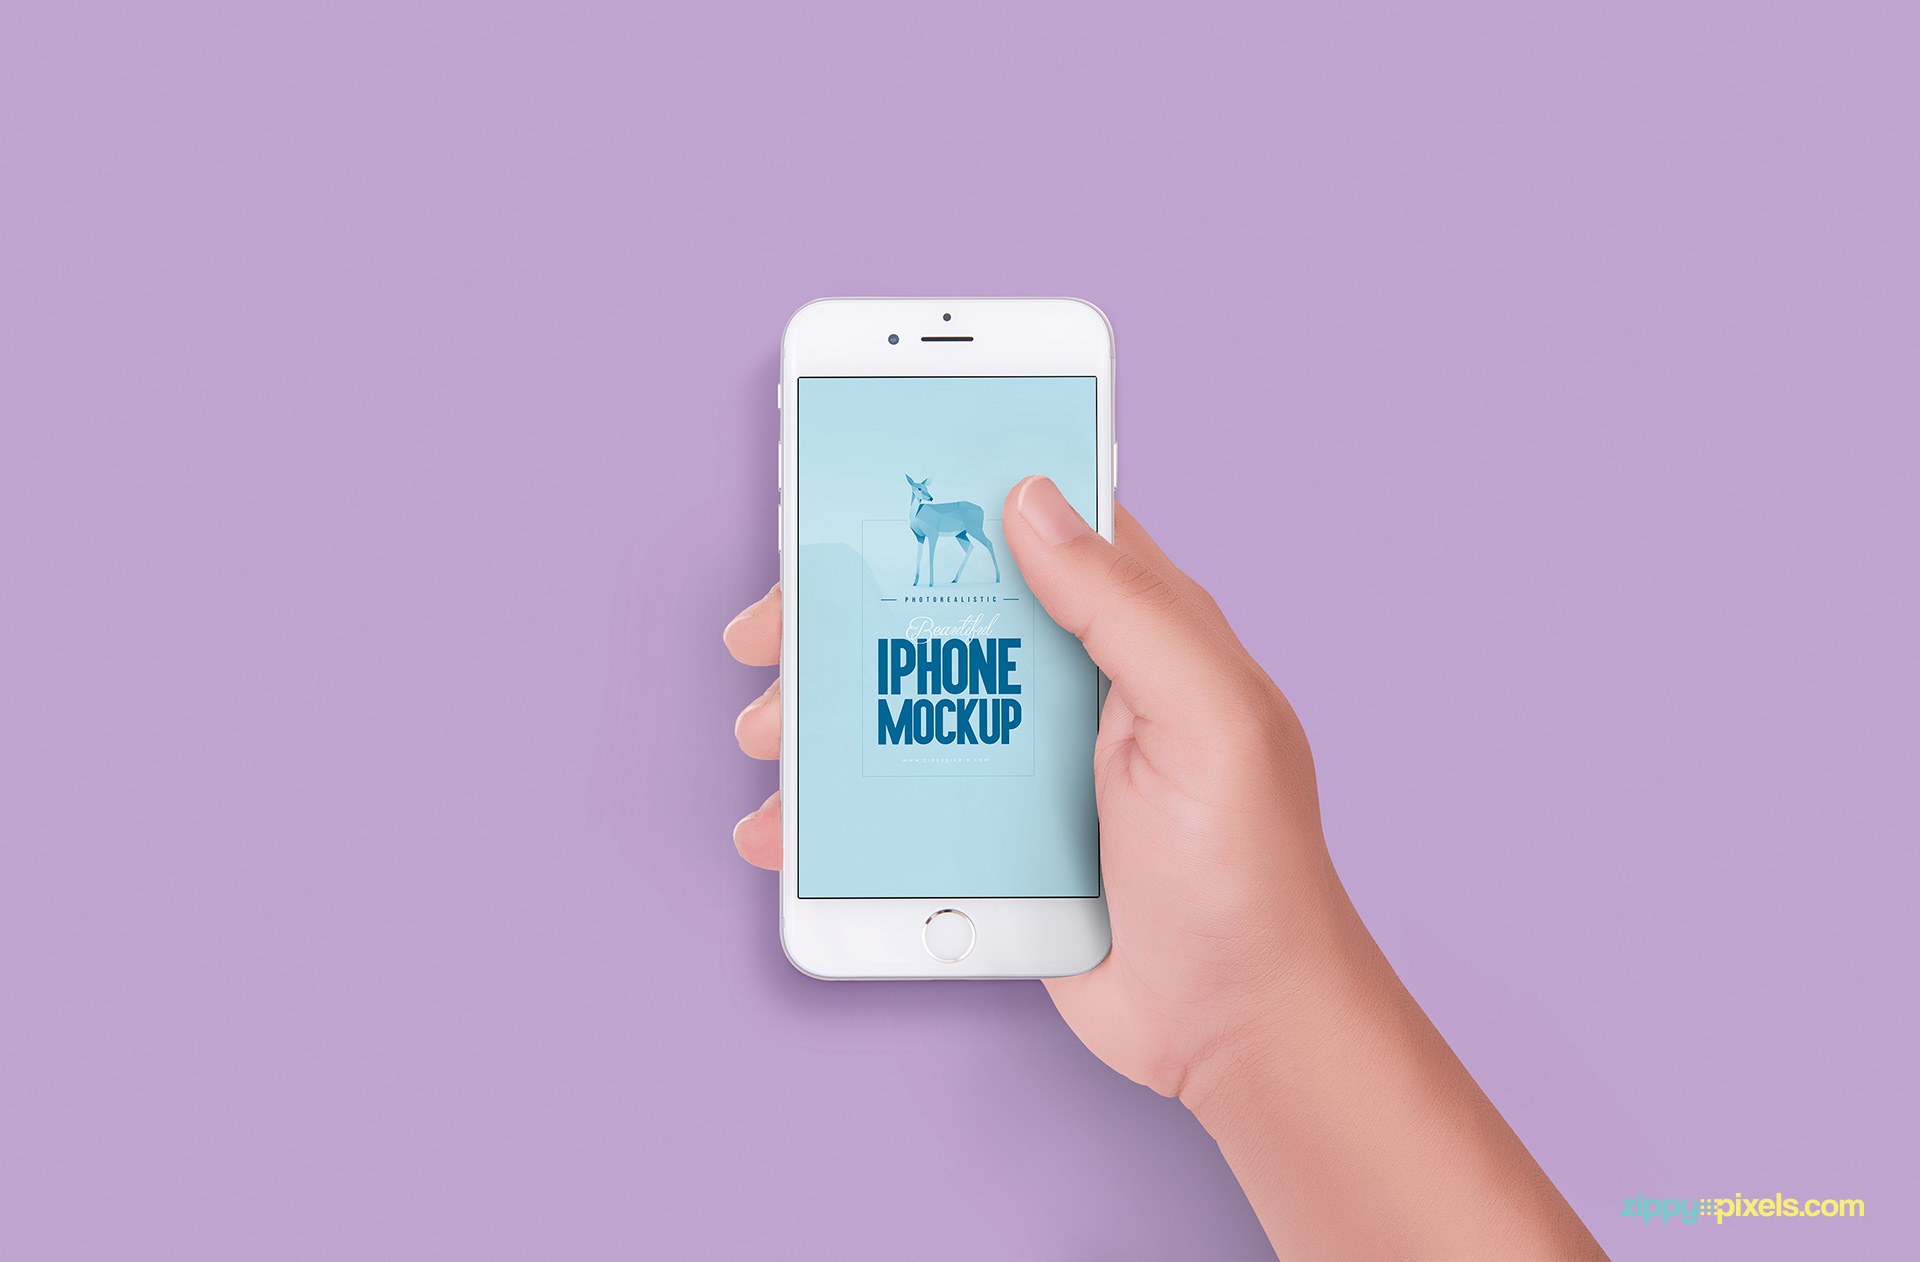 Free iPhone 6S design mockup for web designers